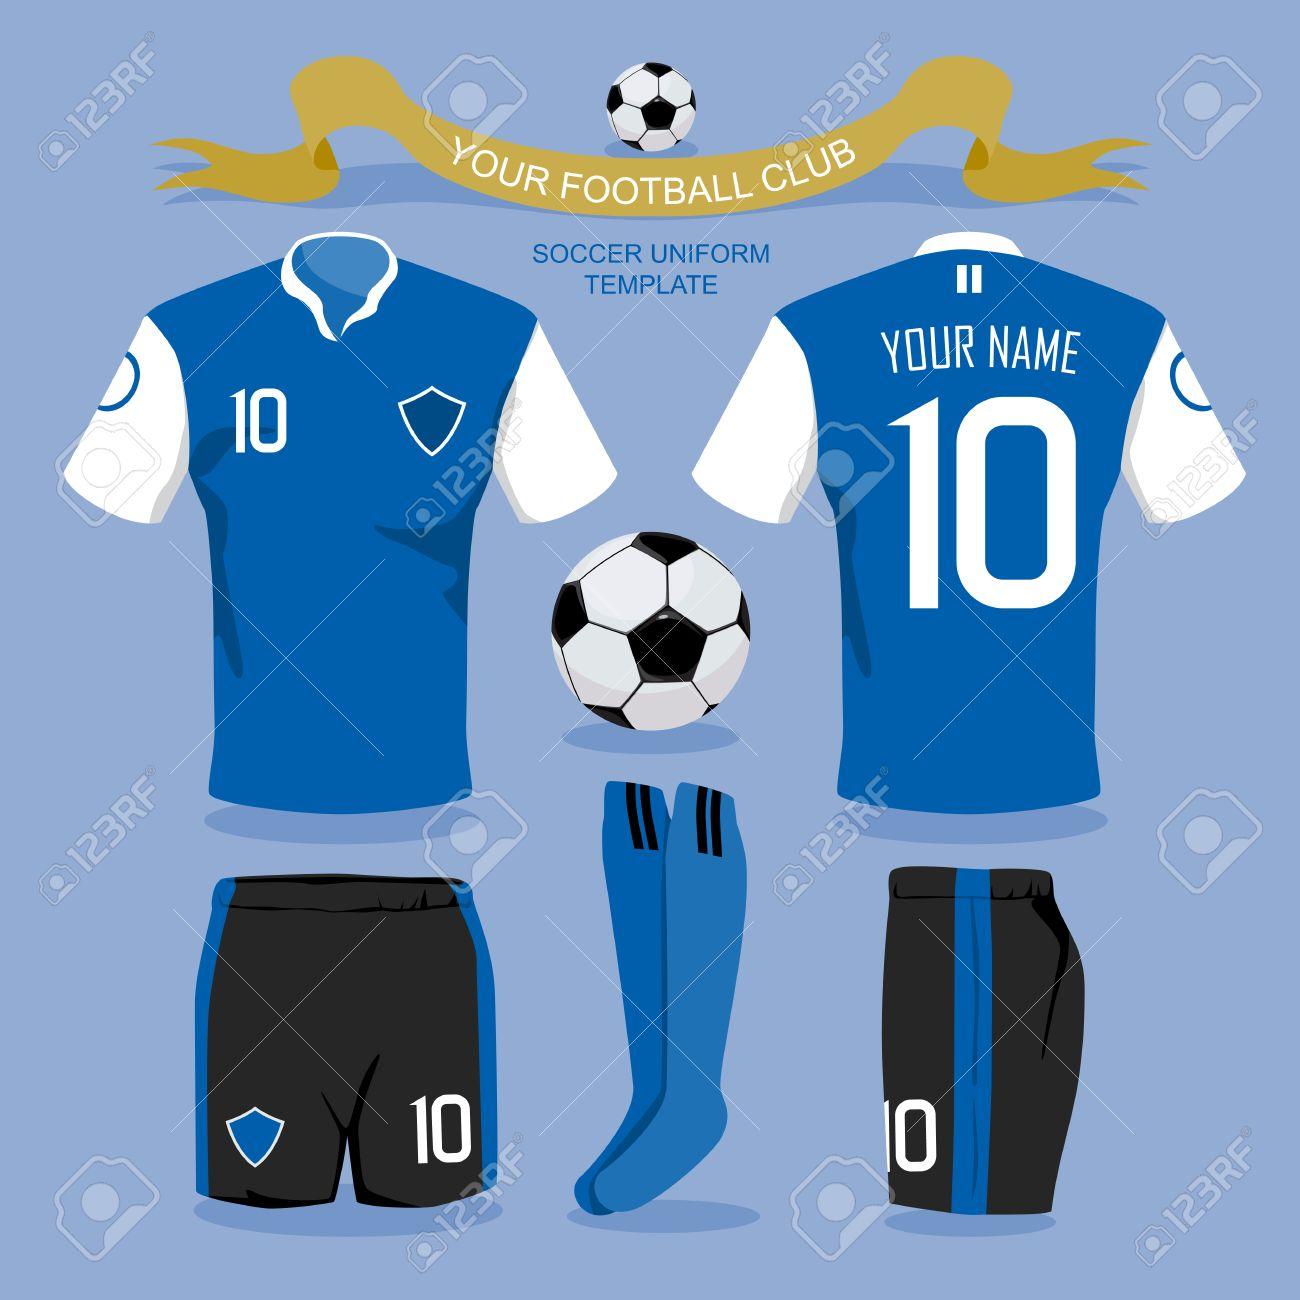 Soccer uniform template for your football club, illustration design. - 41579473